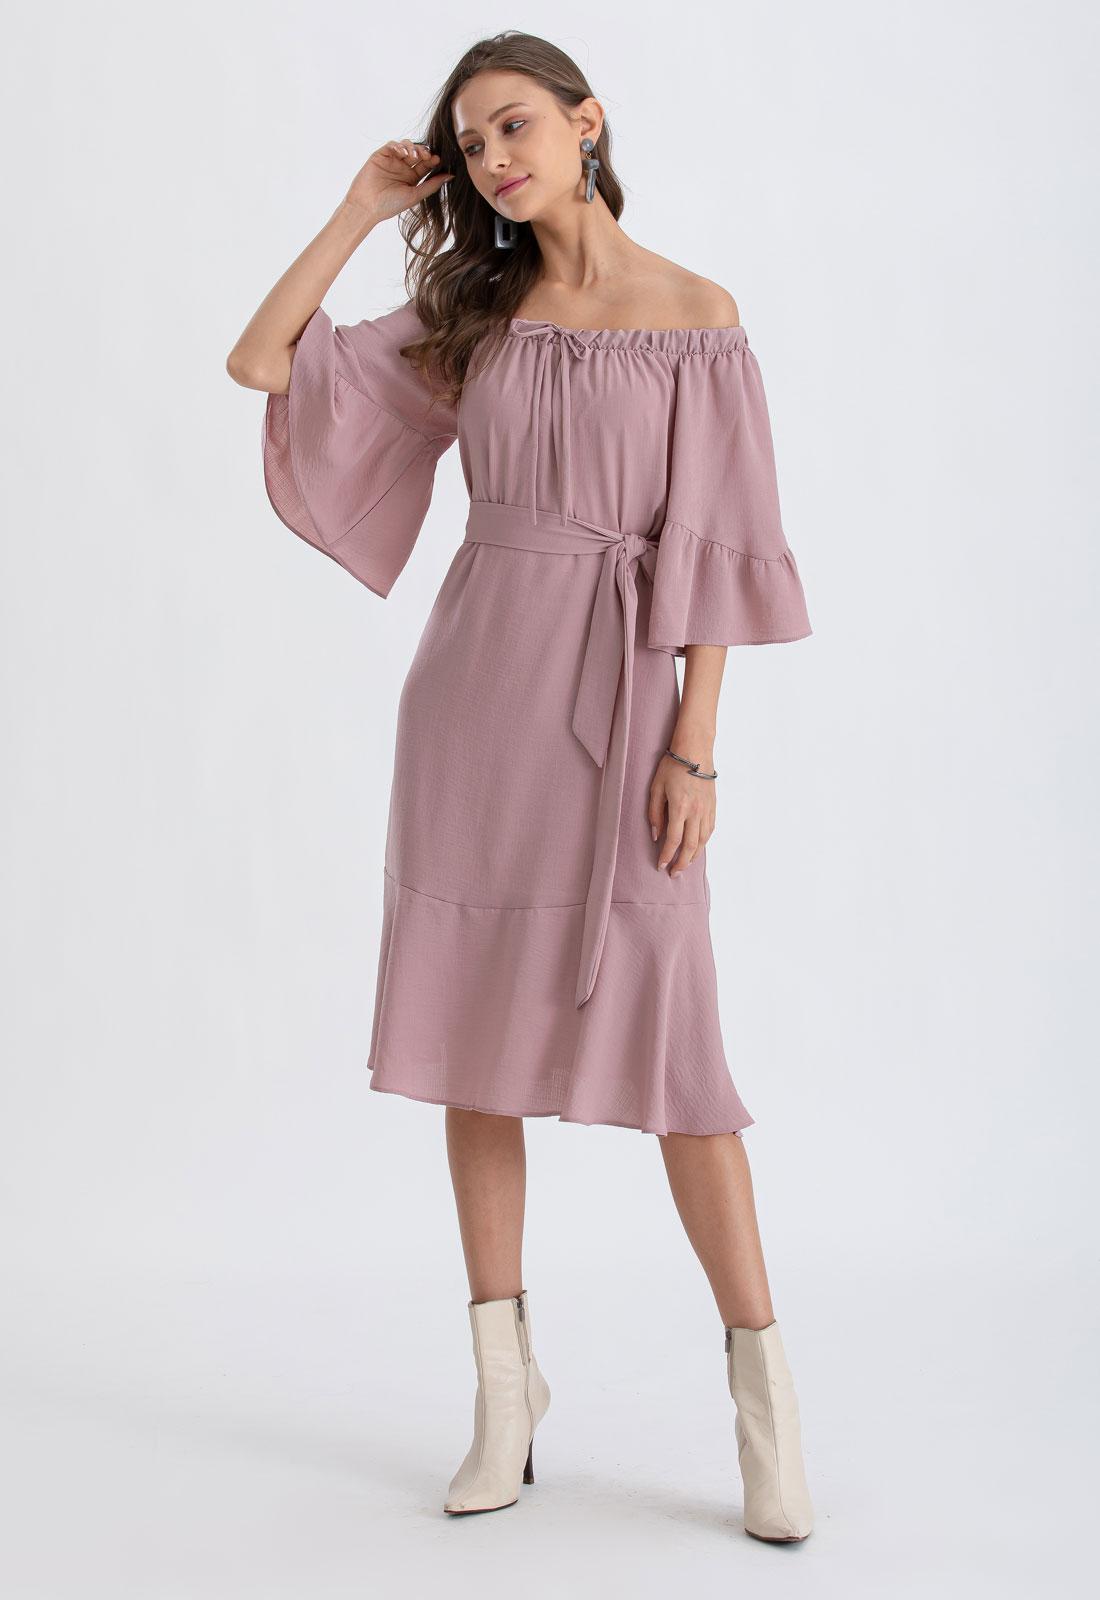 Vestido cigana manga 3/4 elástico rosê Ref. 02654